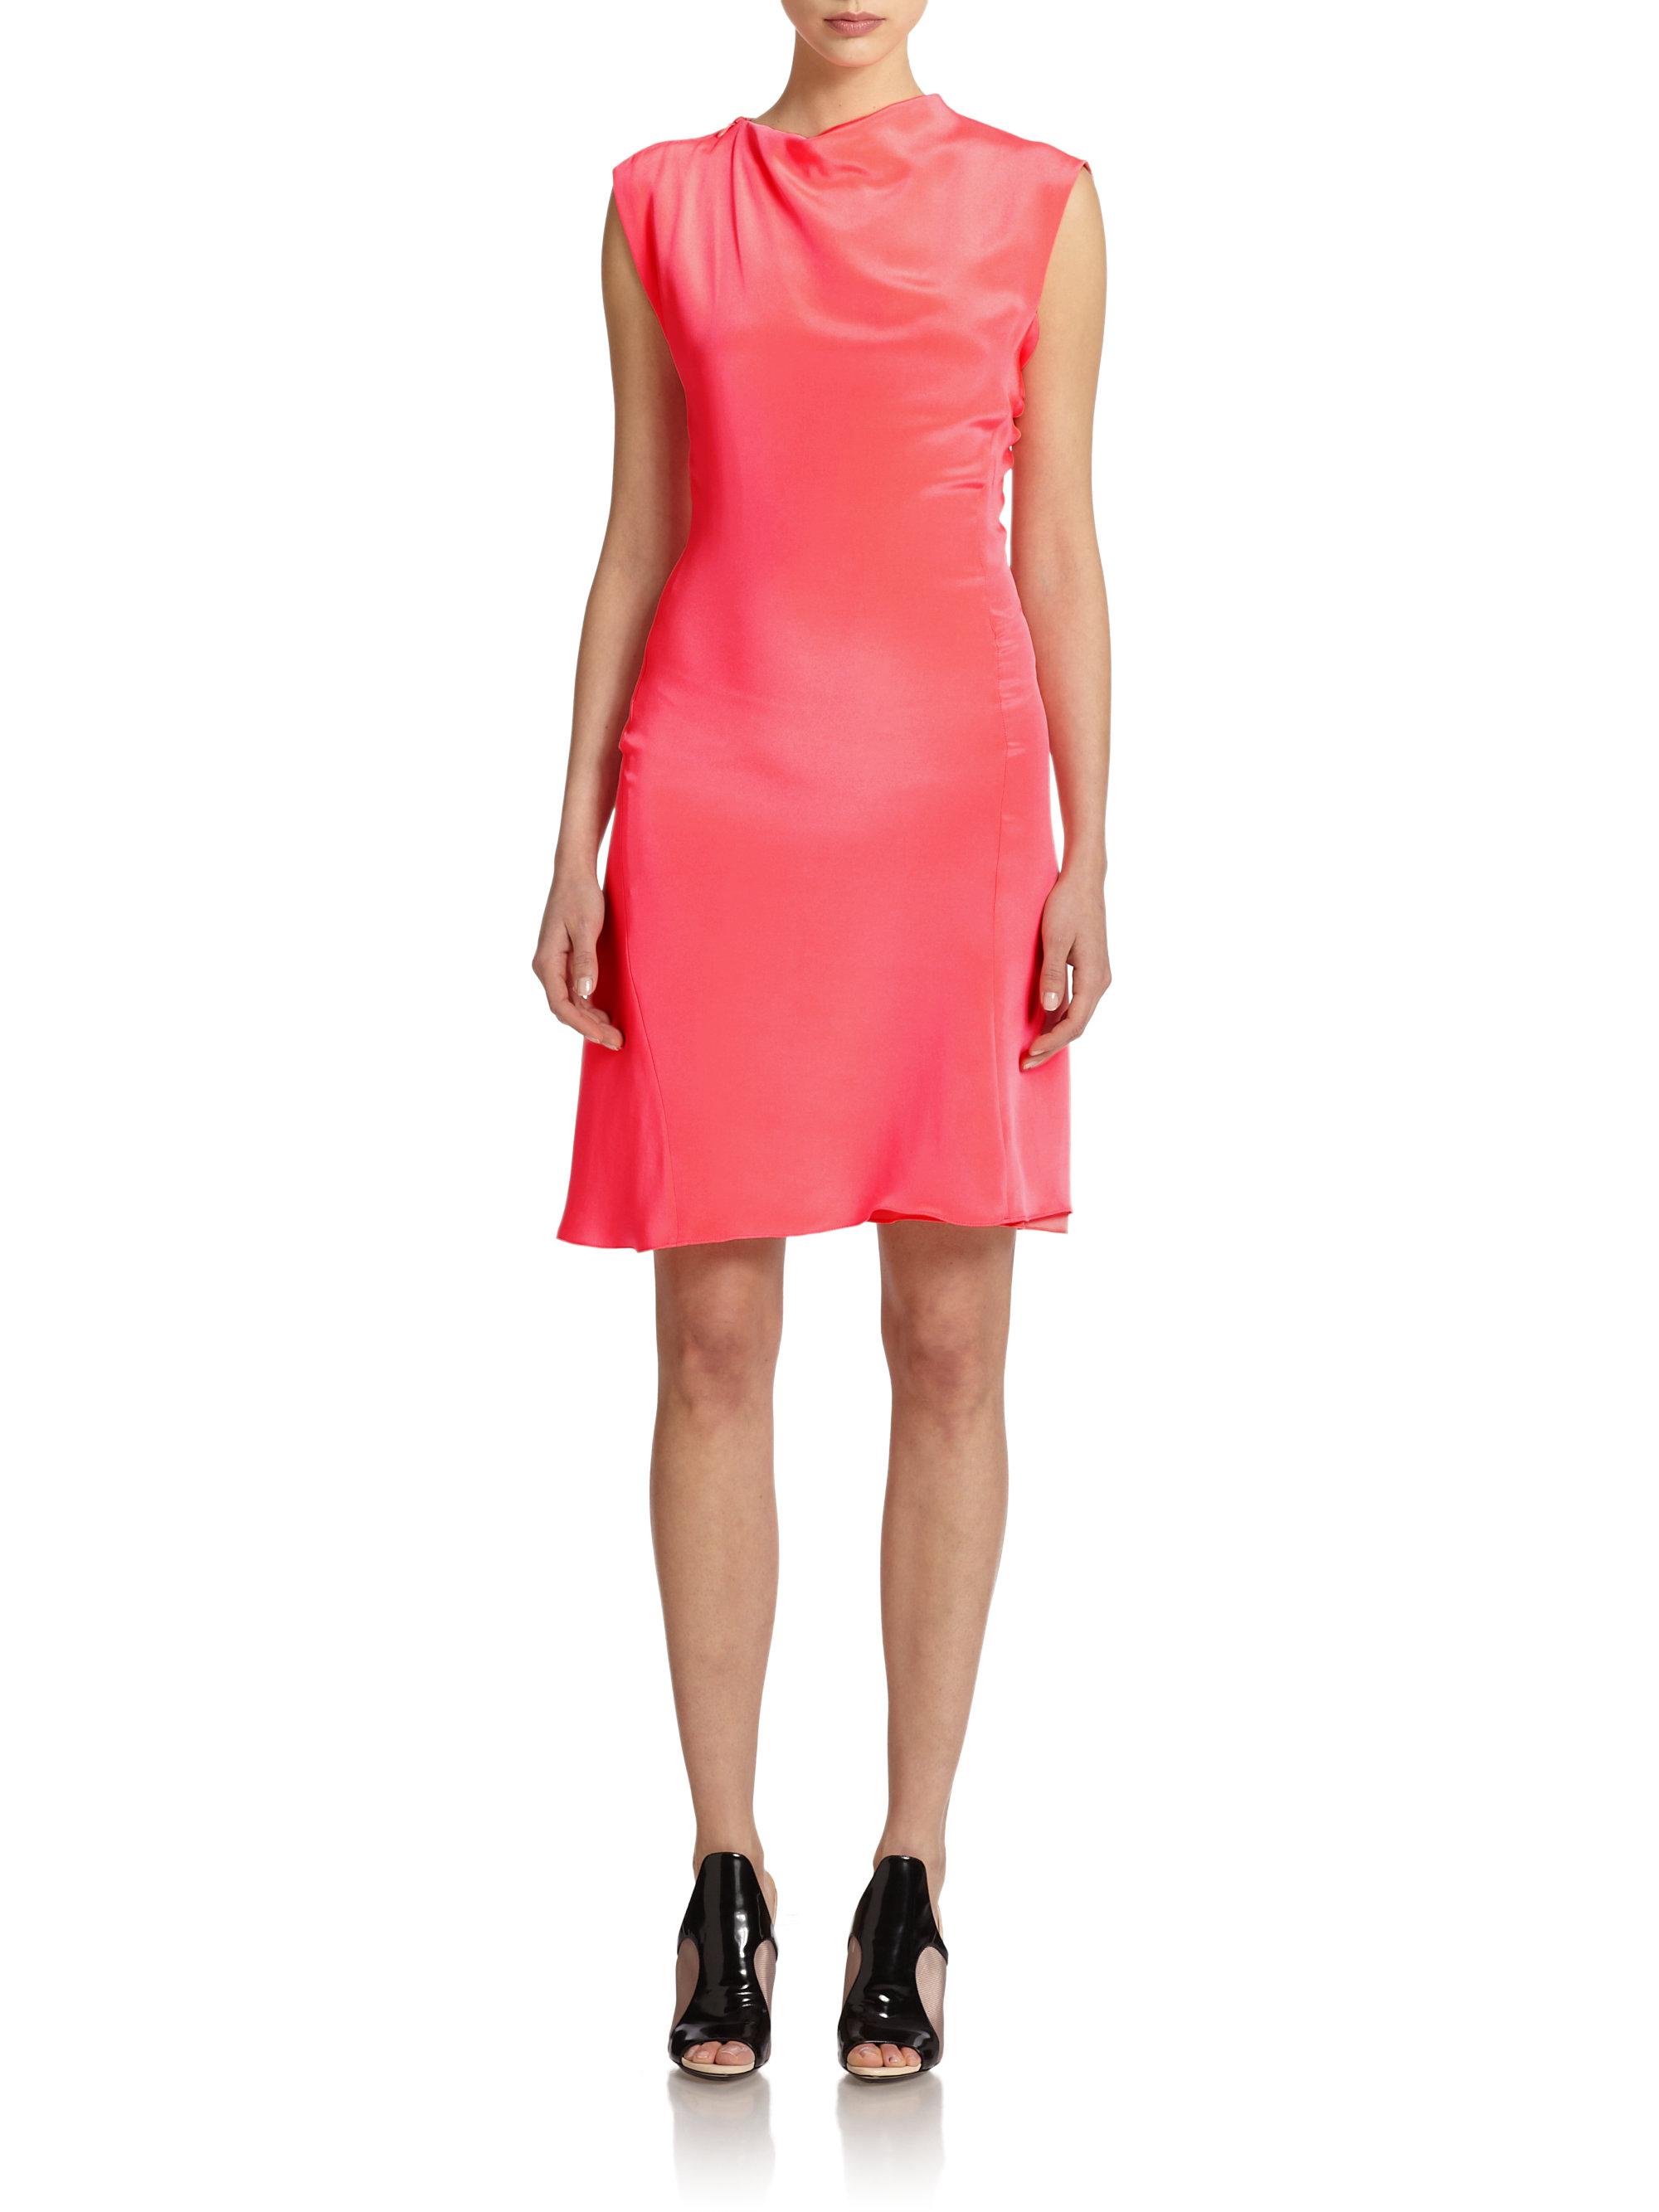 1d20b2b5741 3.1 Phillip Lim Silk Draped Asymmetrical Dress in Pink - Lyst